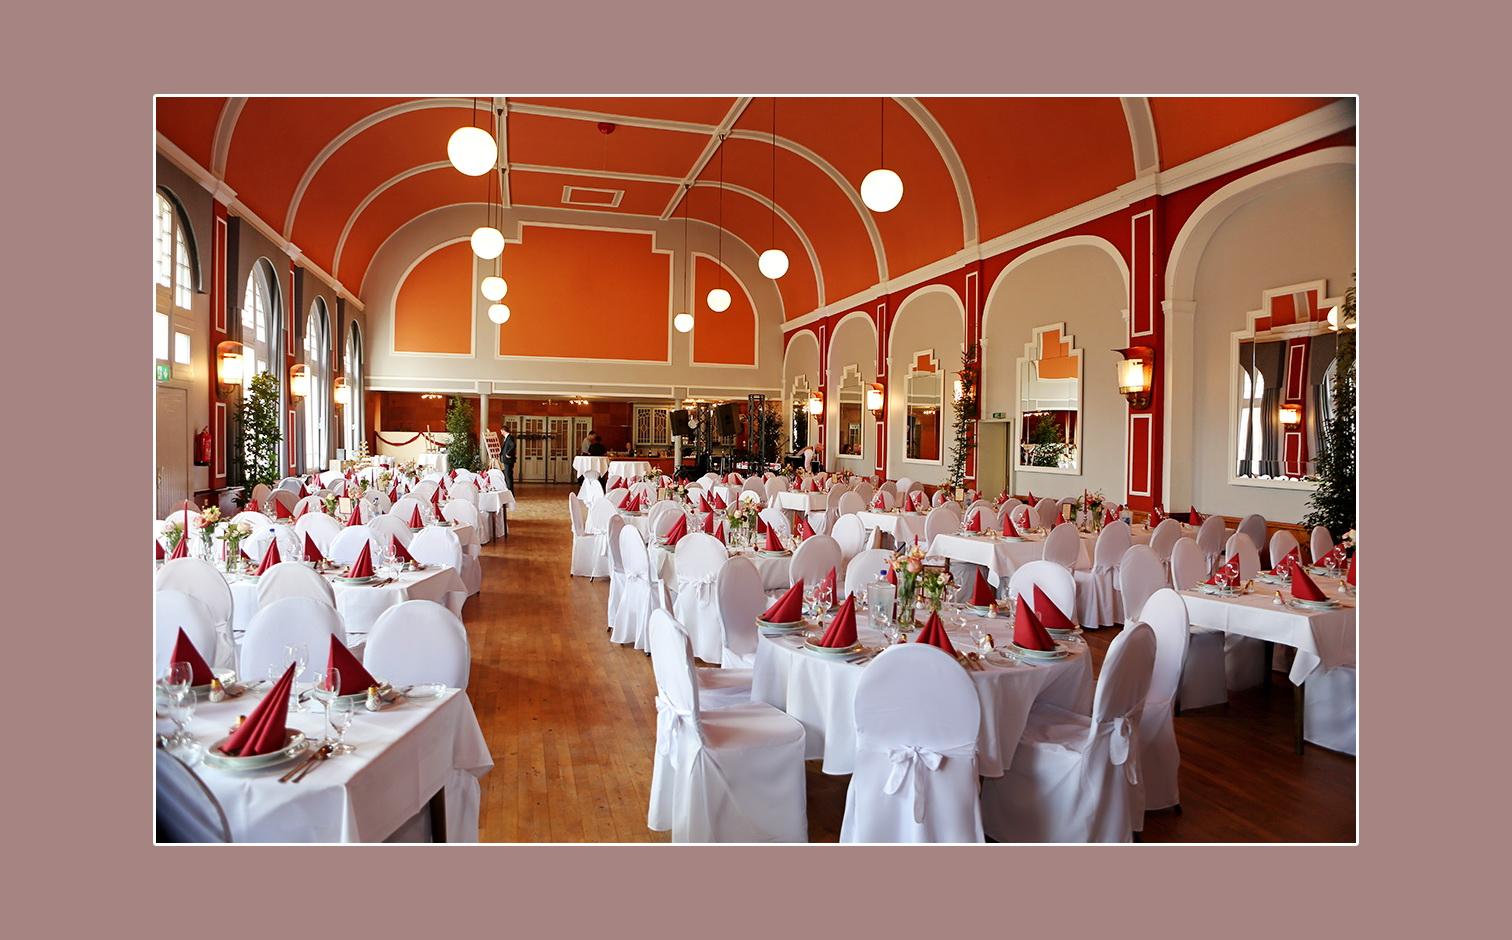 Deko Hochzeitslocation Hotel Tenbrock in Gescher